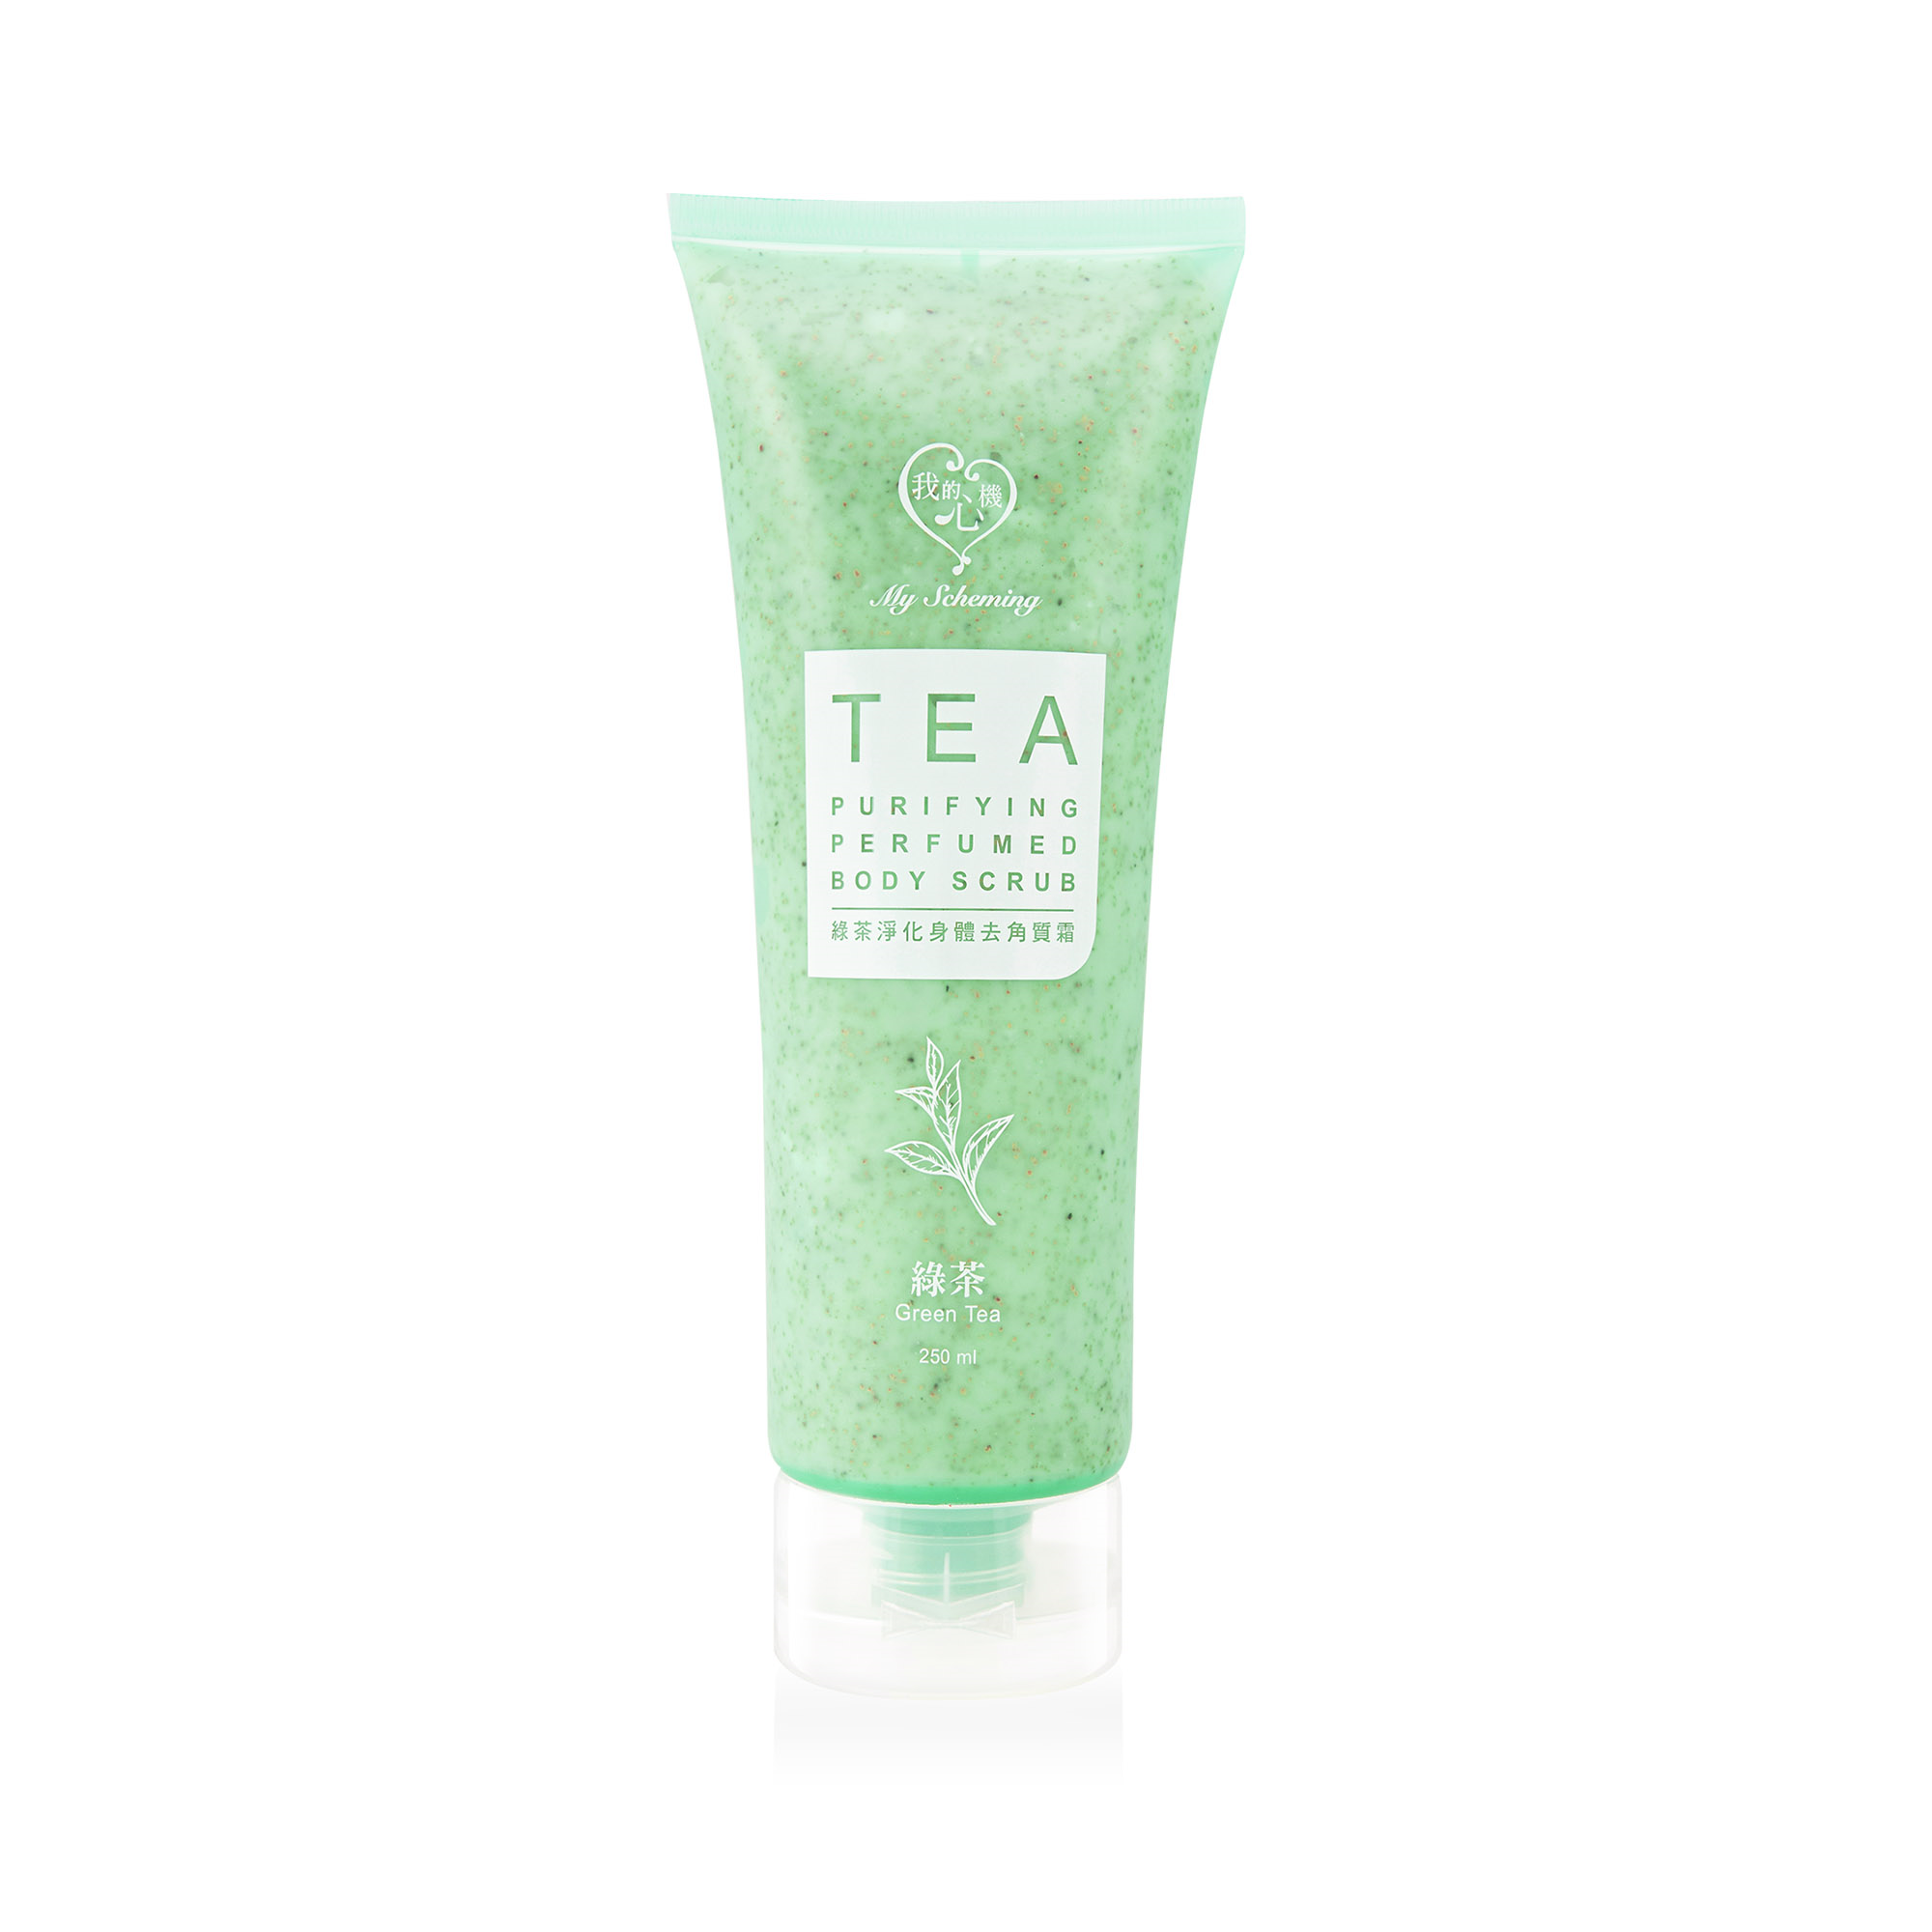 My Scheming - Green Tea Purifying Perfumed Body Scrub